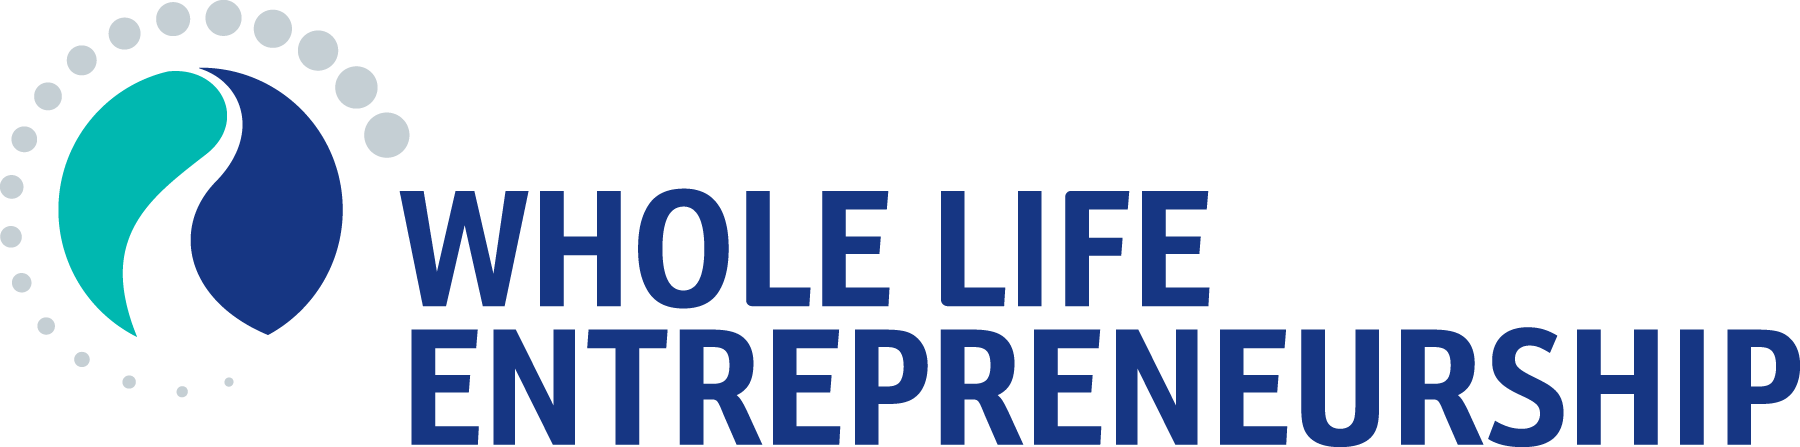 Whole Life Entrepreneurship